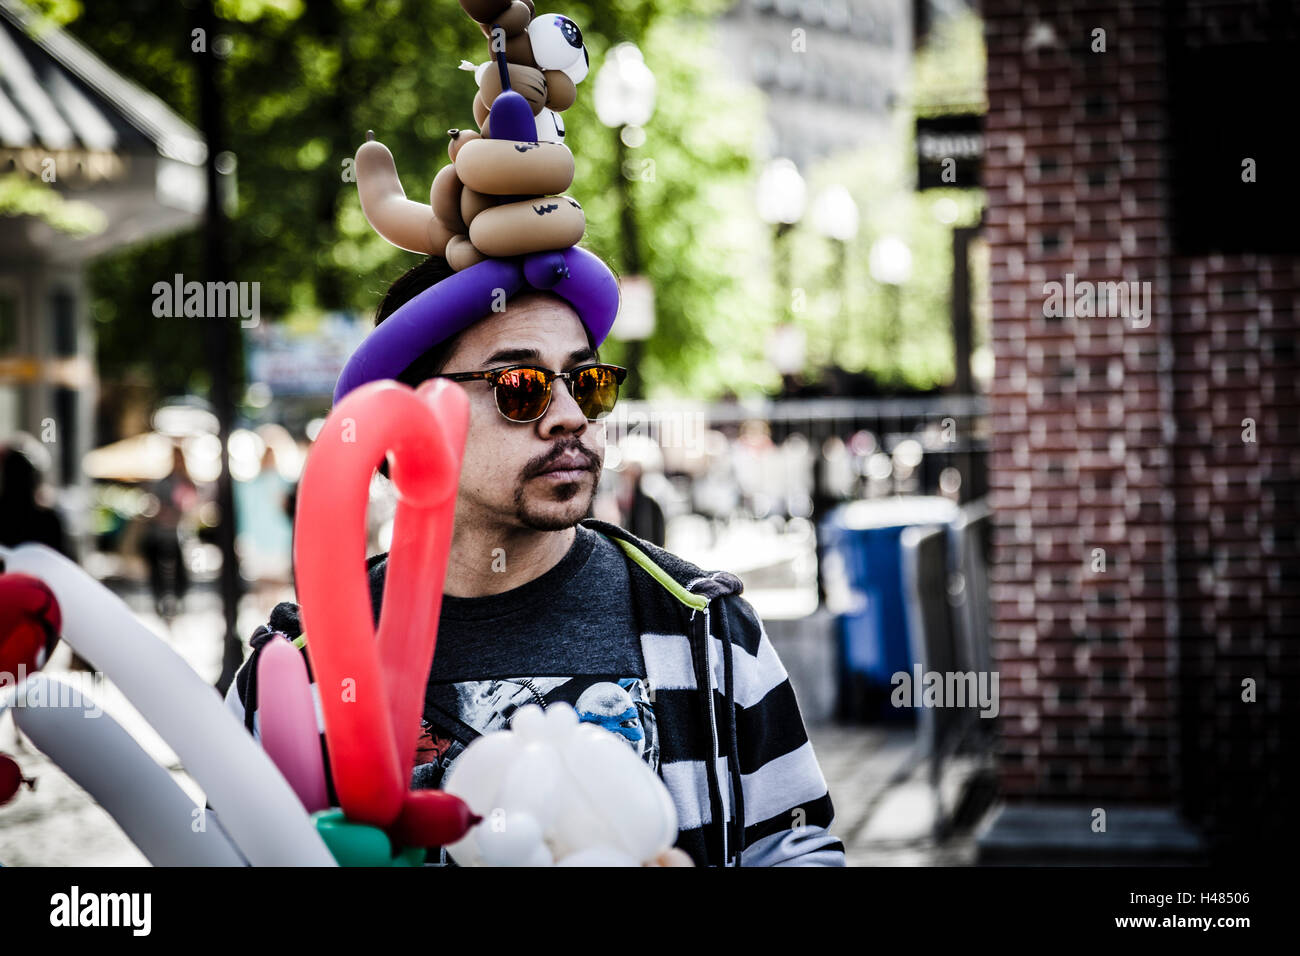 Balloon man in Quincy Market, Boston - Stock Image